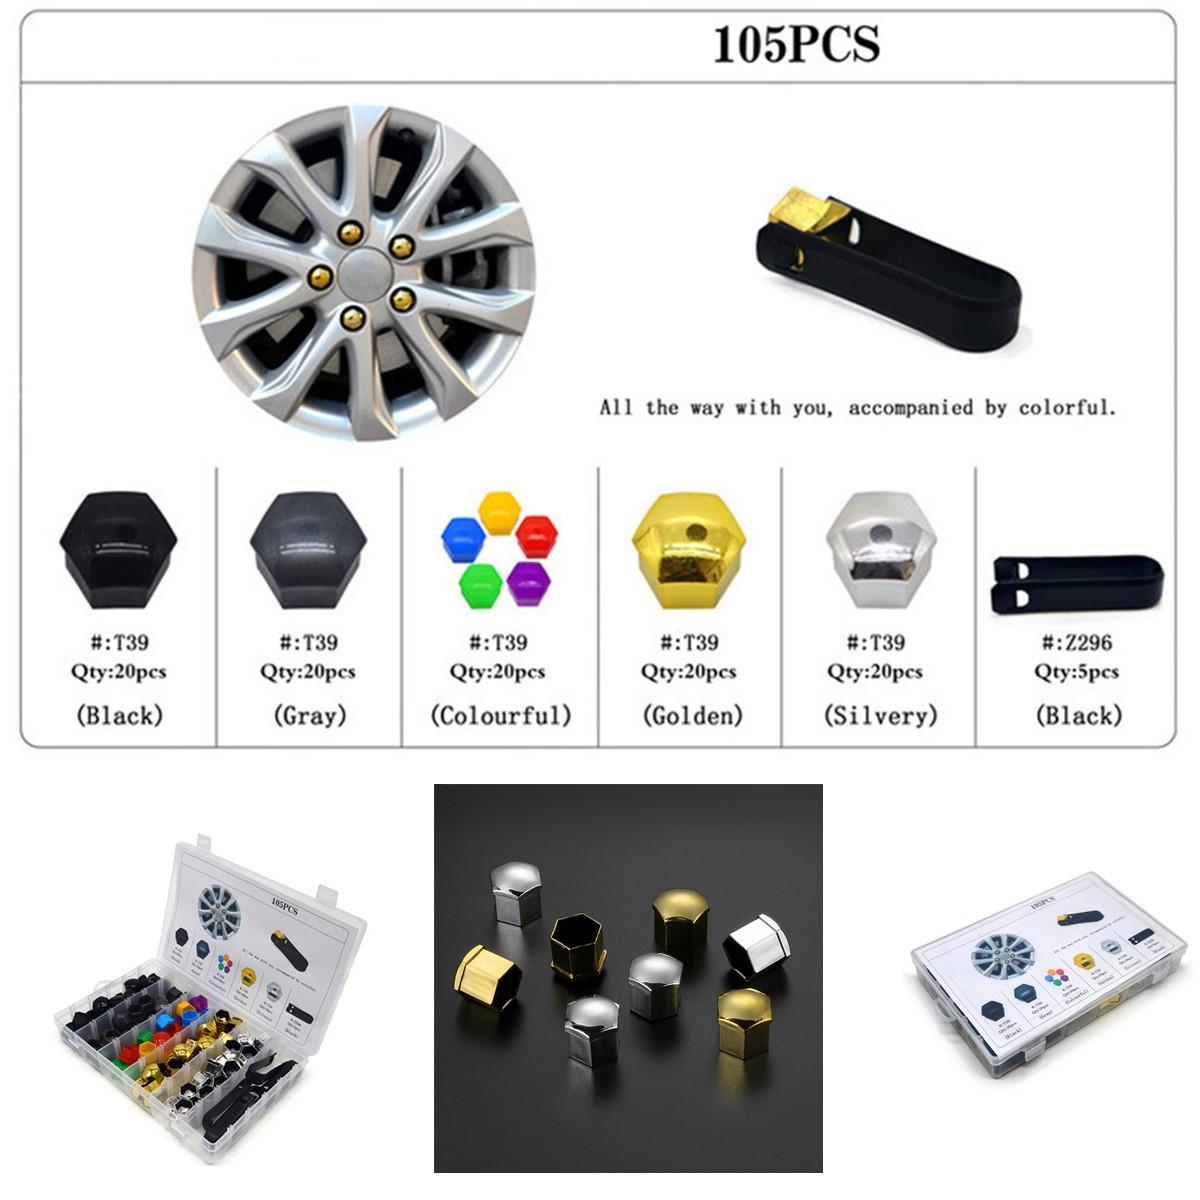 100Pcs 17mm Auto Car Tyre Wheel Nut Screw Bolt Protection Covers Caps Anti-Rust